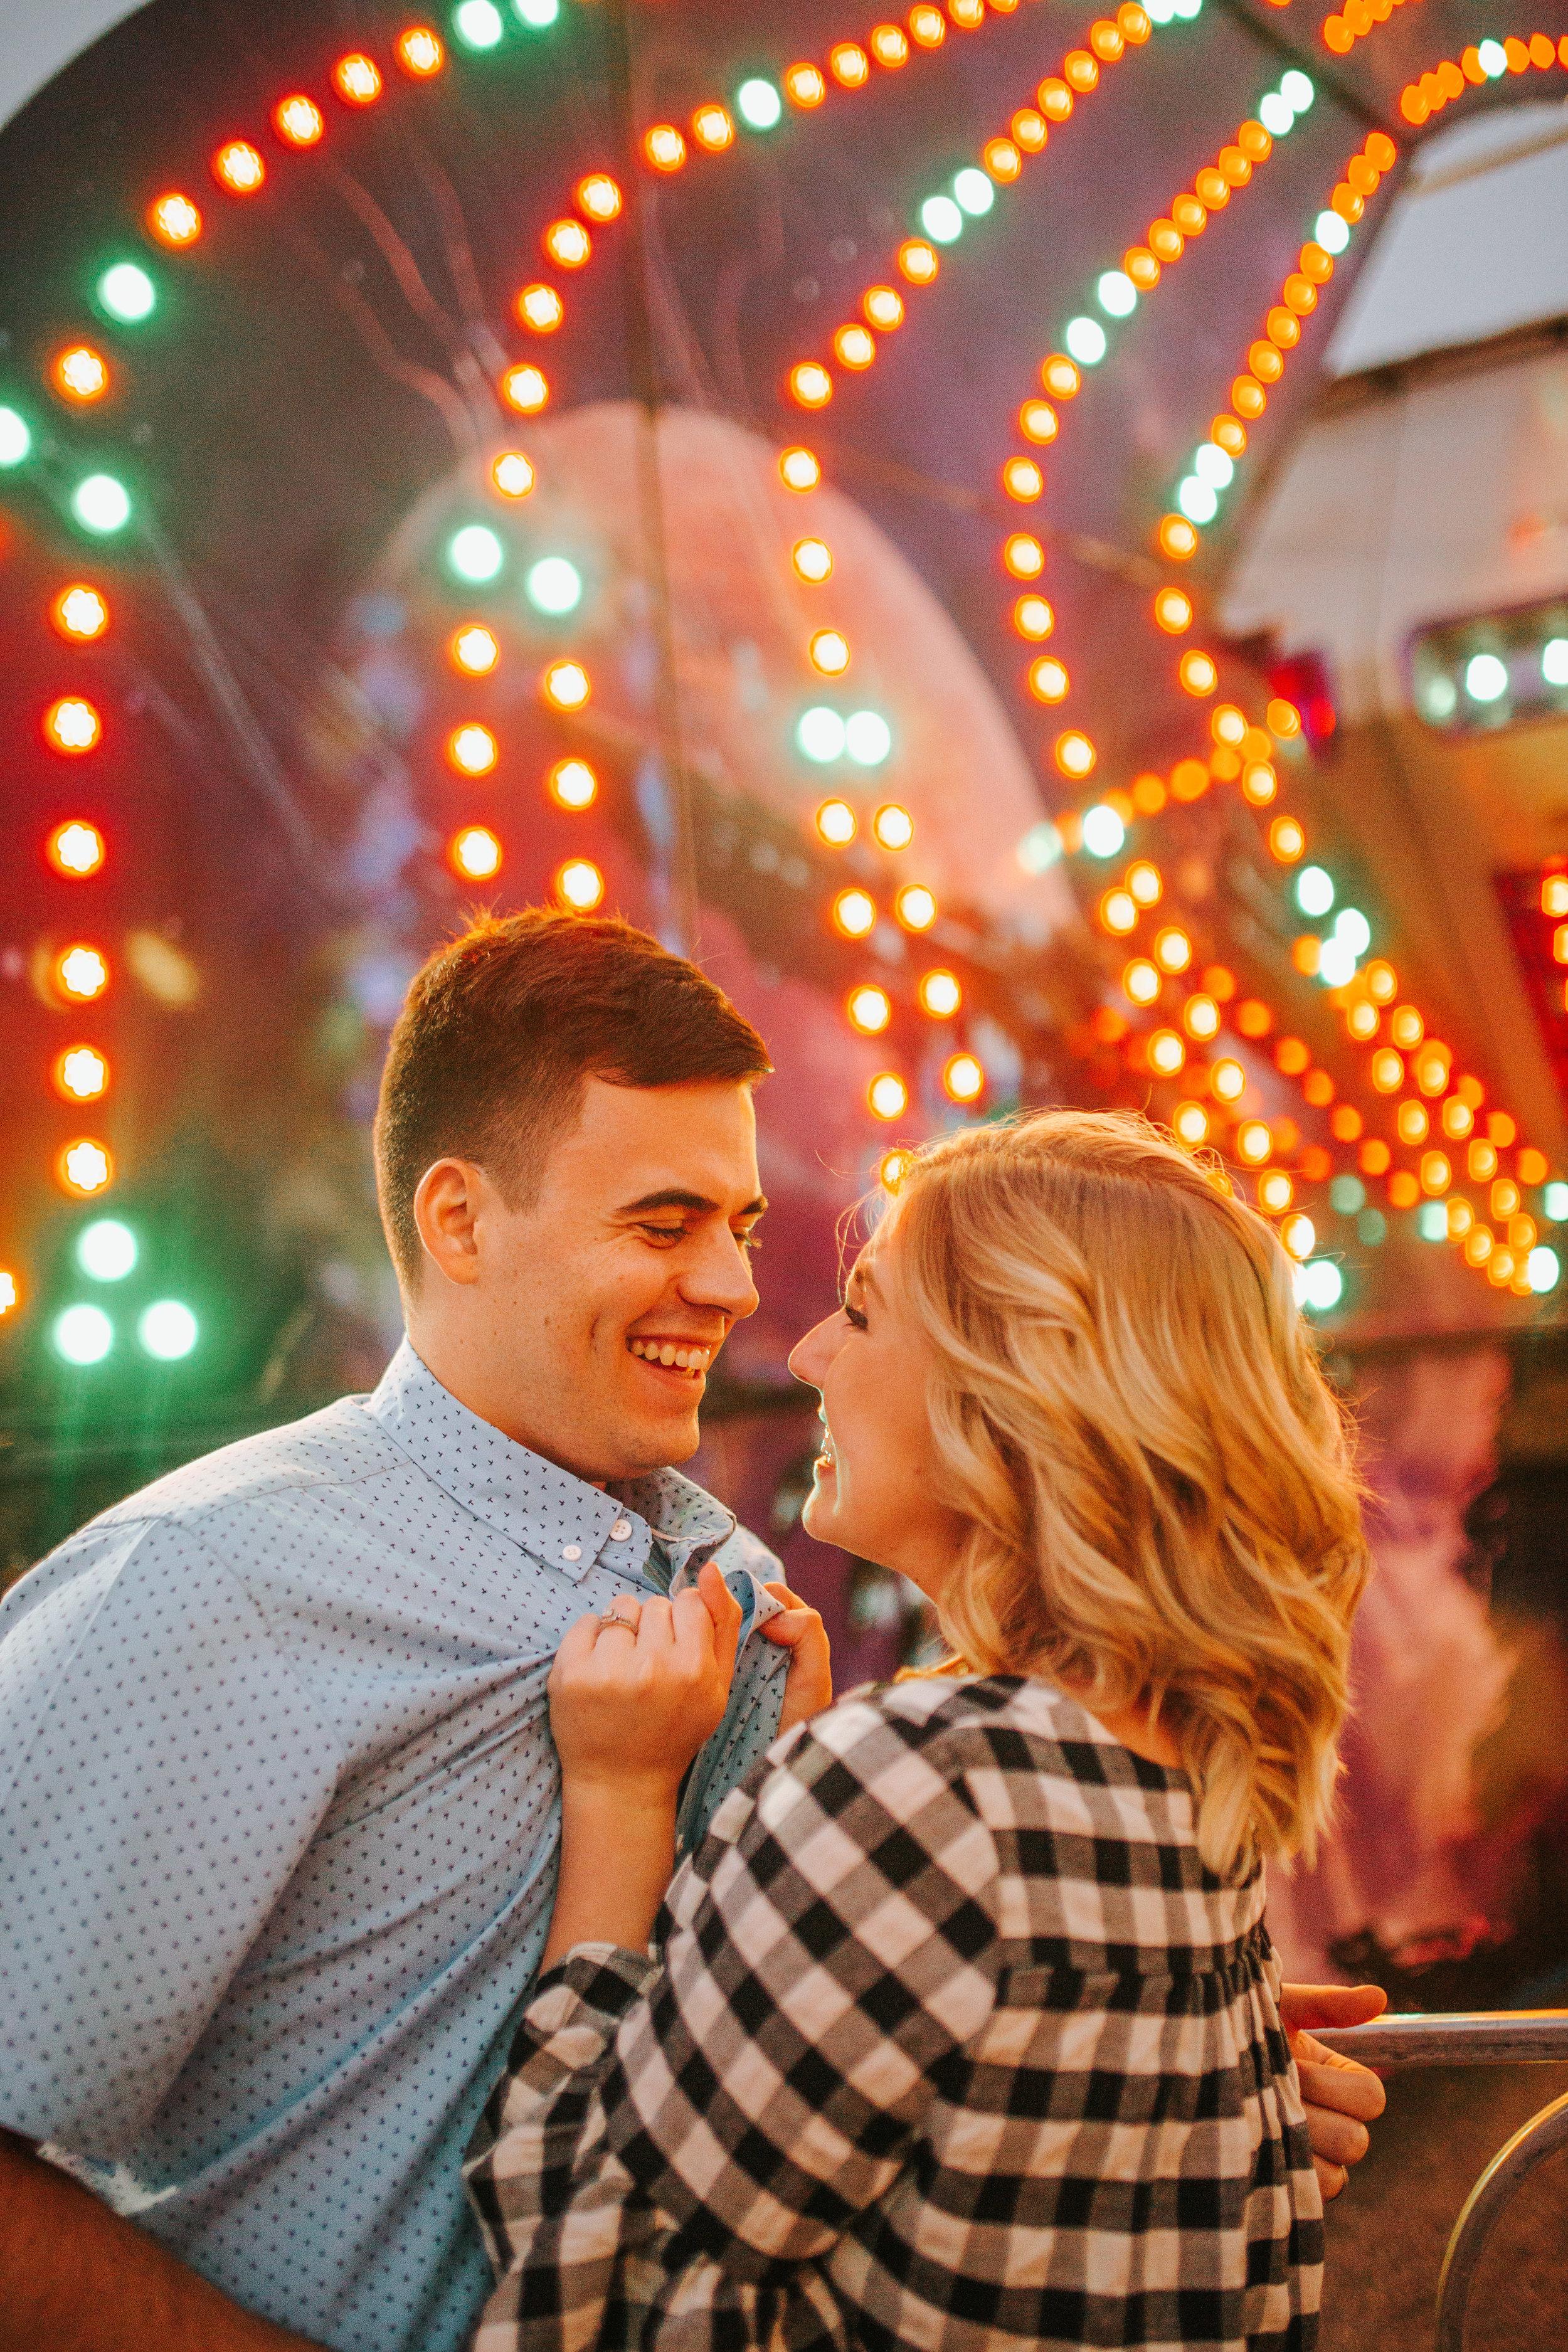 Morgan + Cody Minisession Lookforthelightphotovideo carnival engagements (111 of 148).jpg